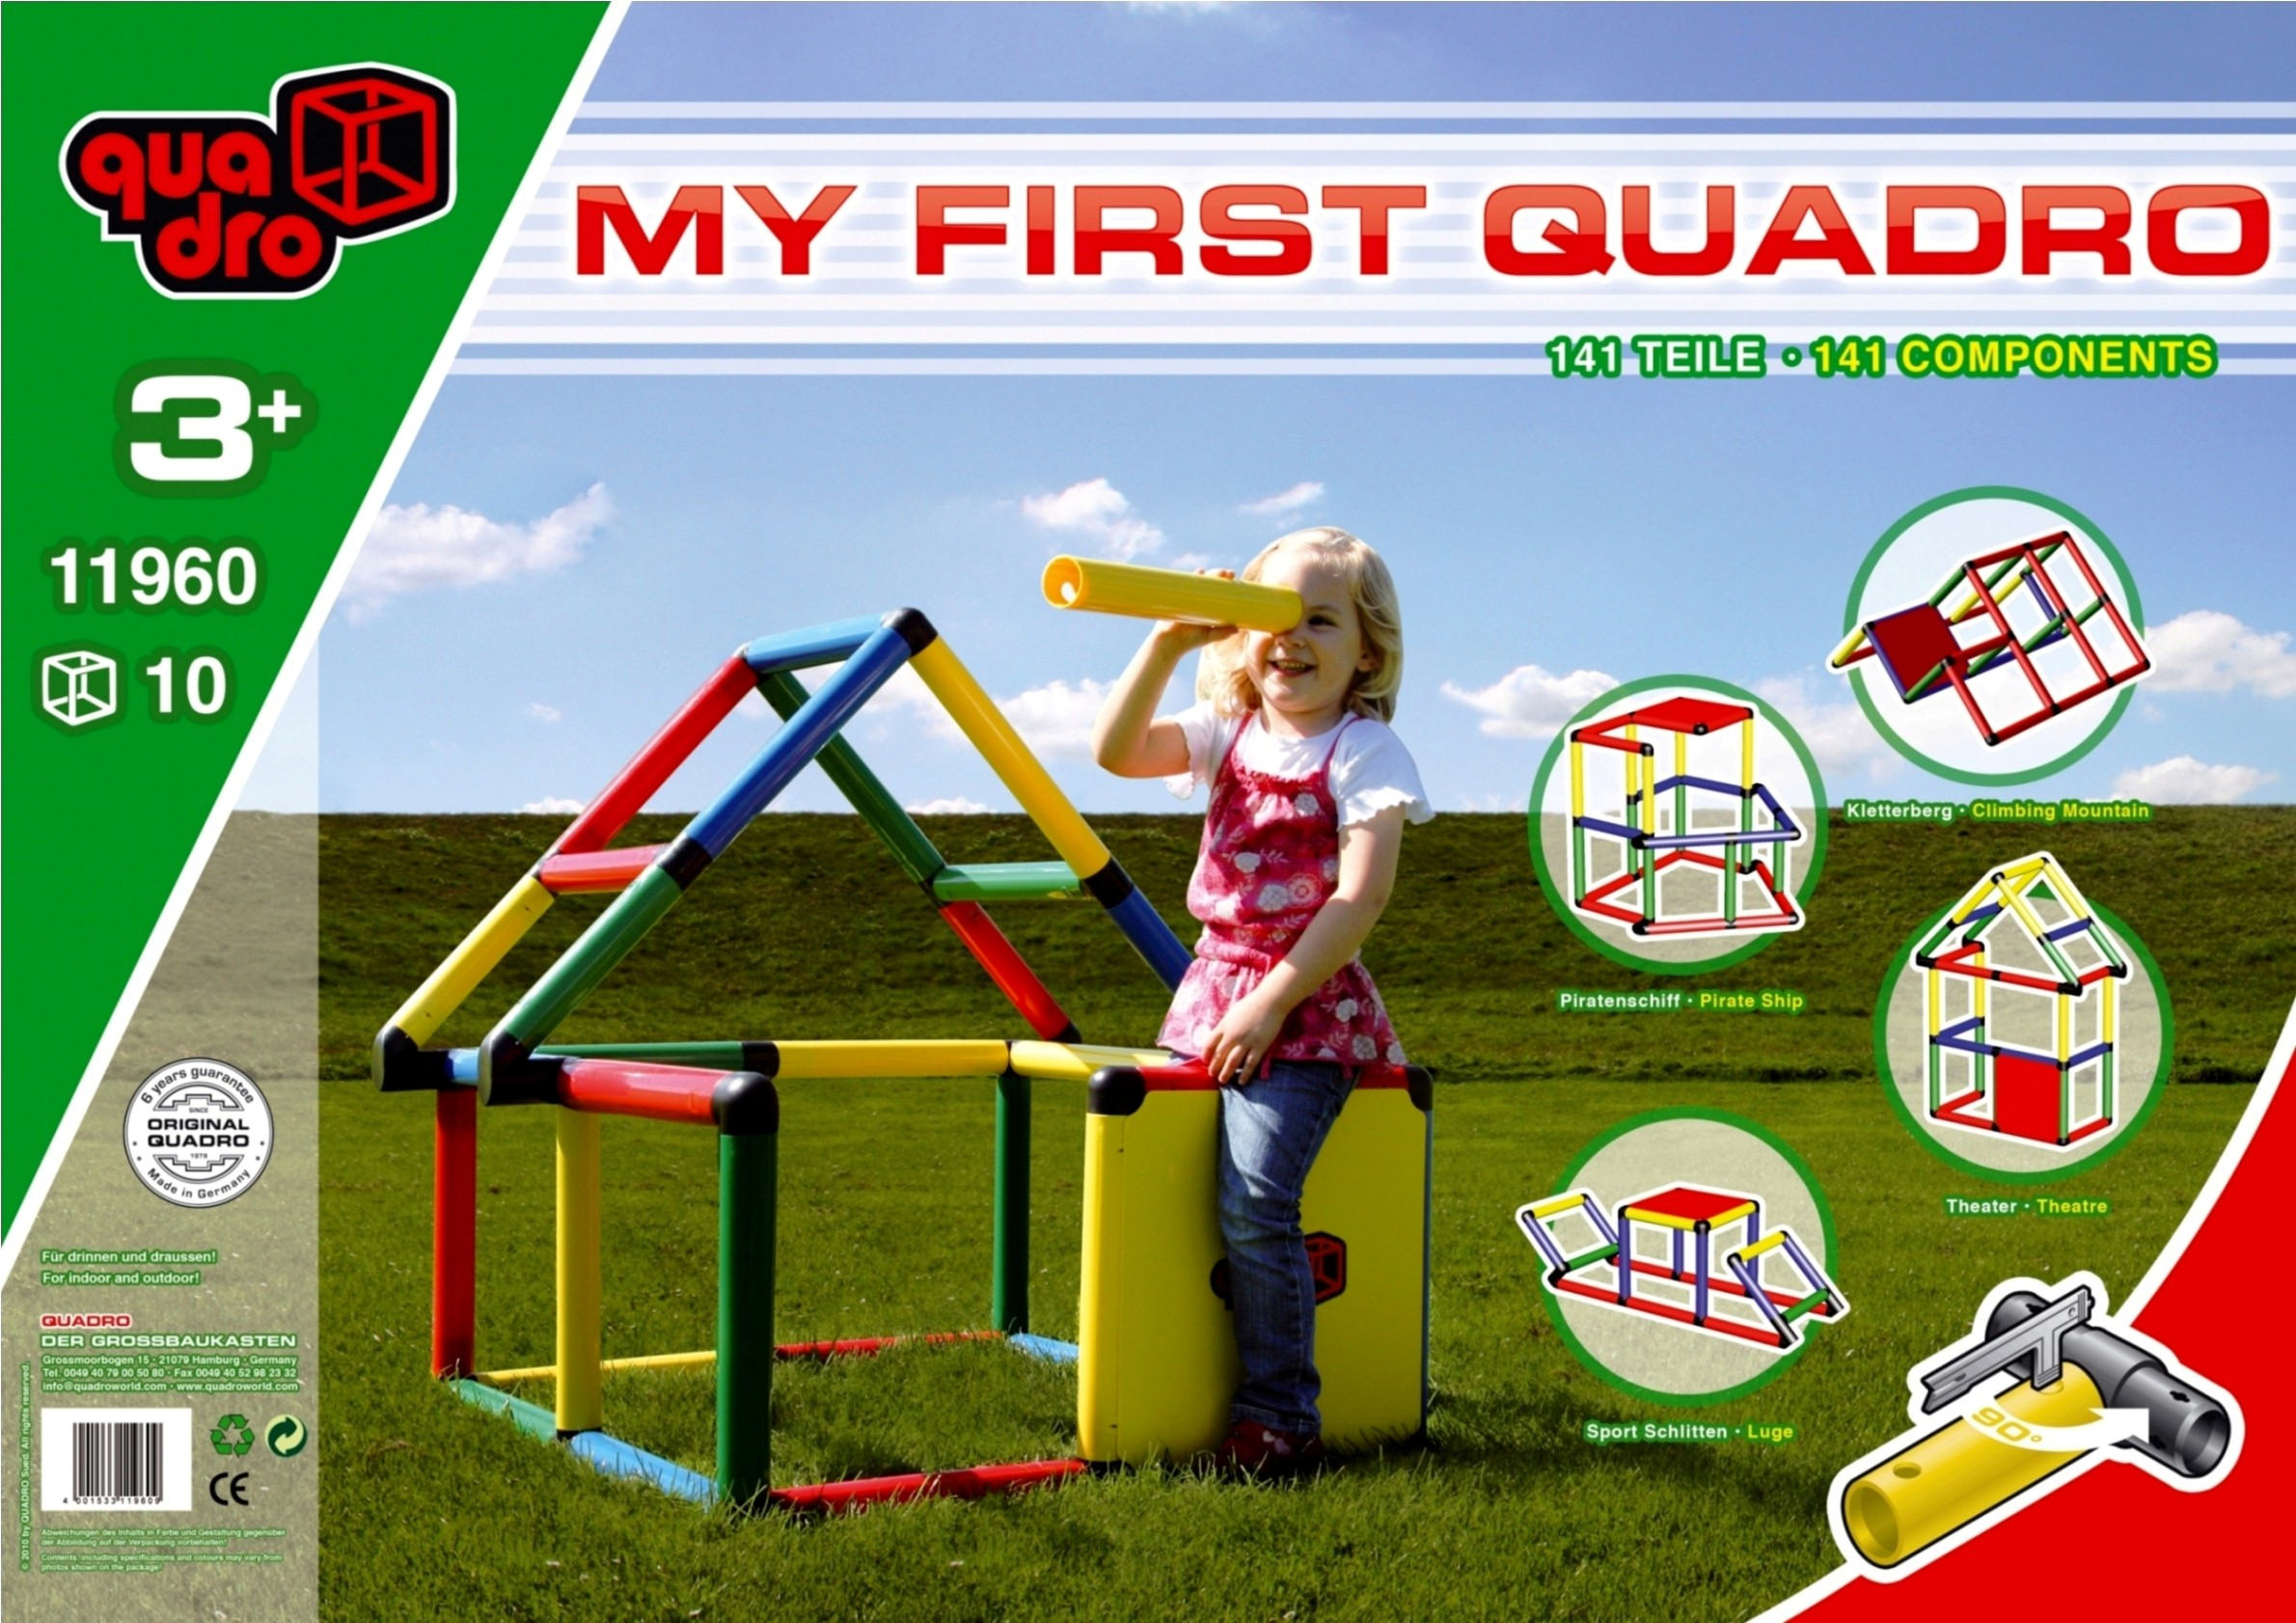 My First Quadro